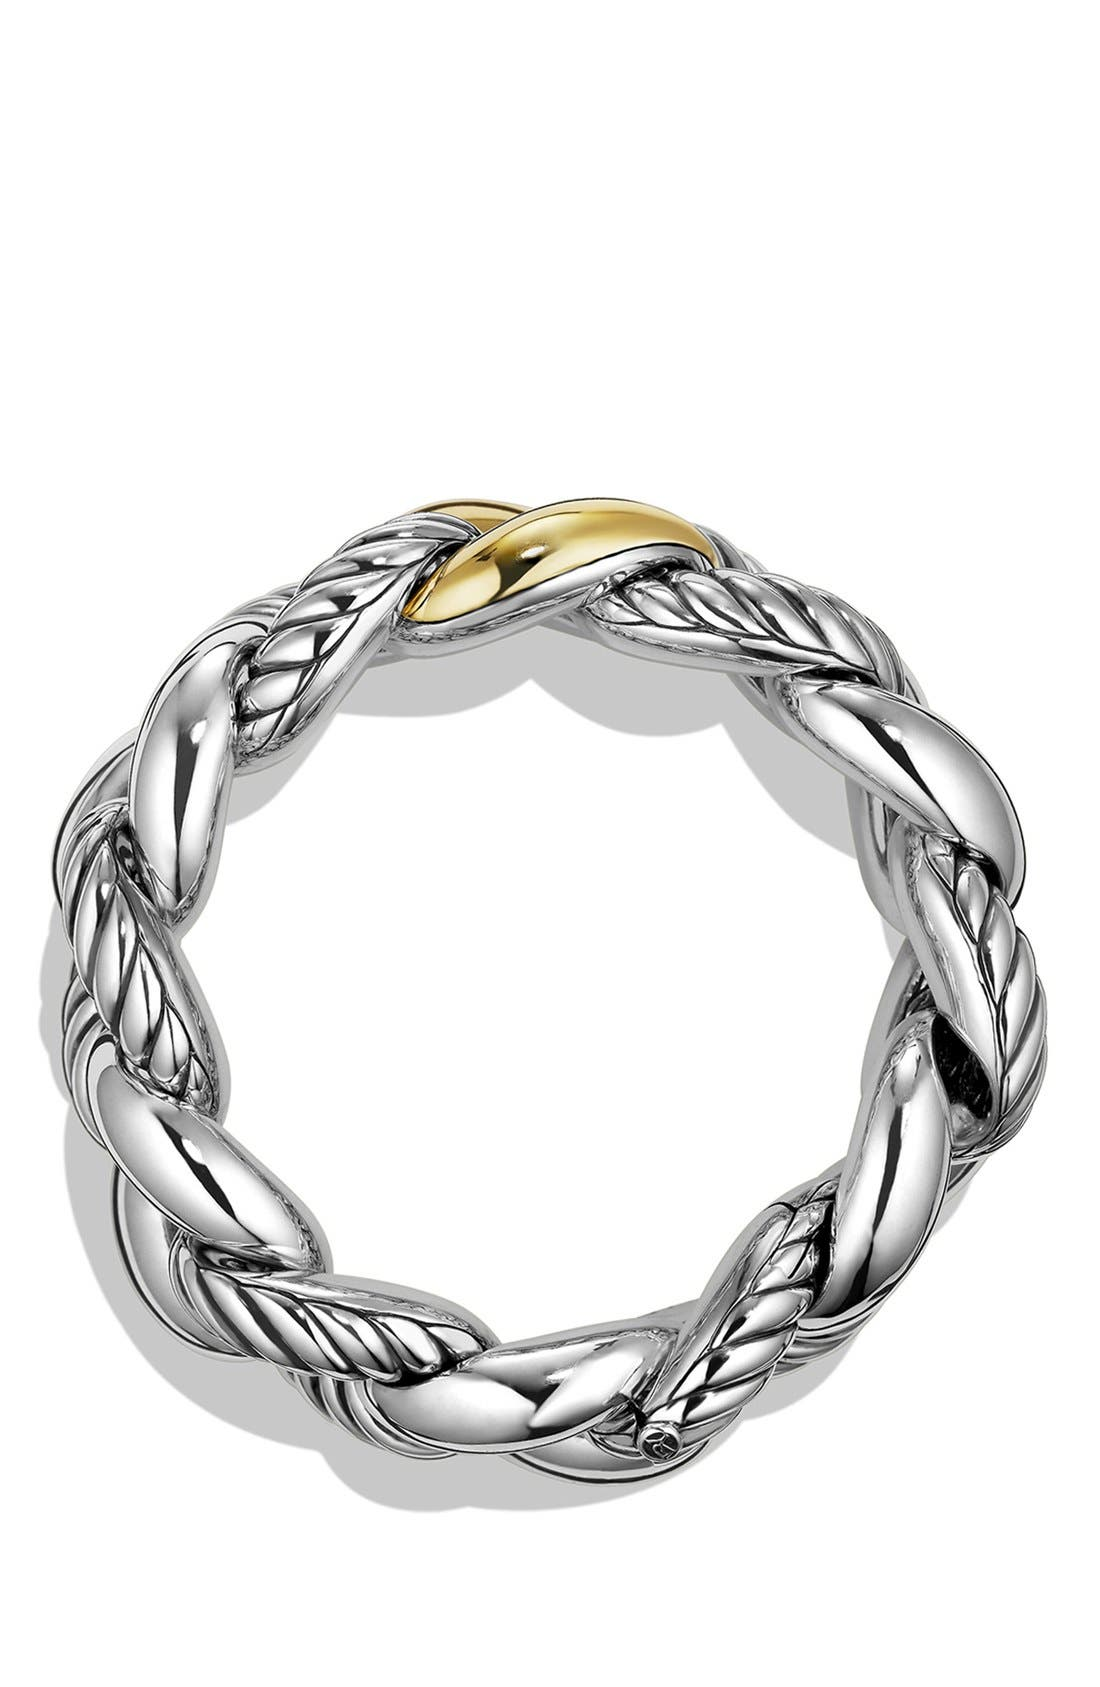 'Belmont' Curb Link Bracelet with 18K Gold,                             Alternate thumbnail 2, color,                             TWO TONE